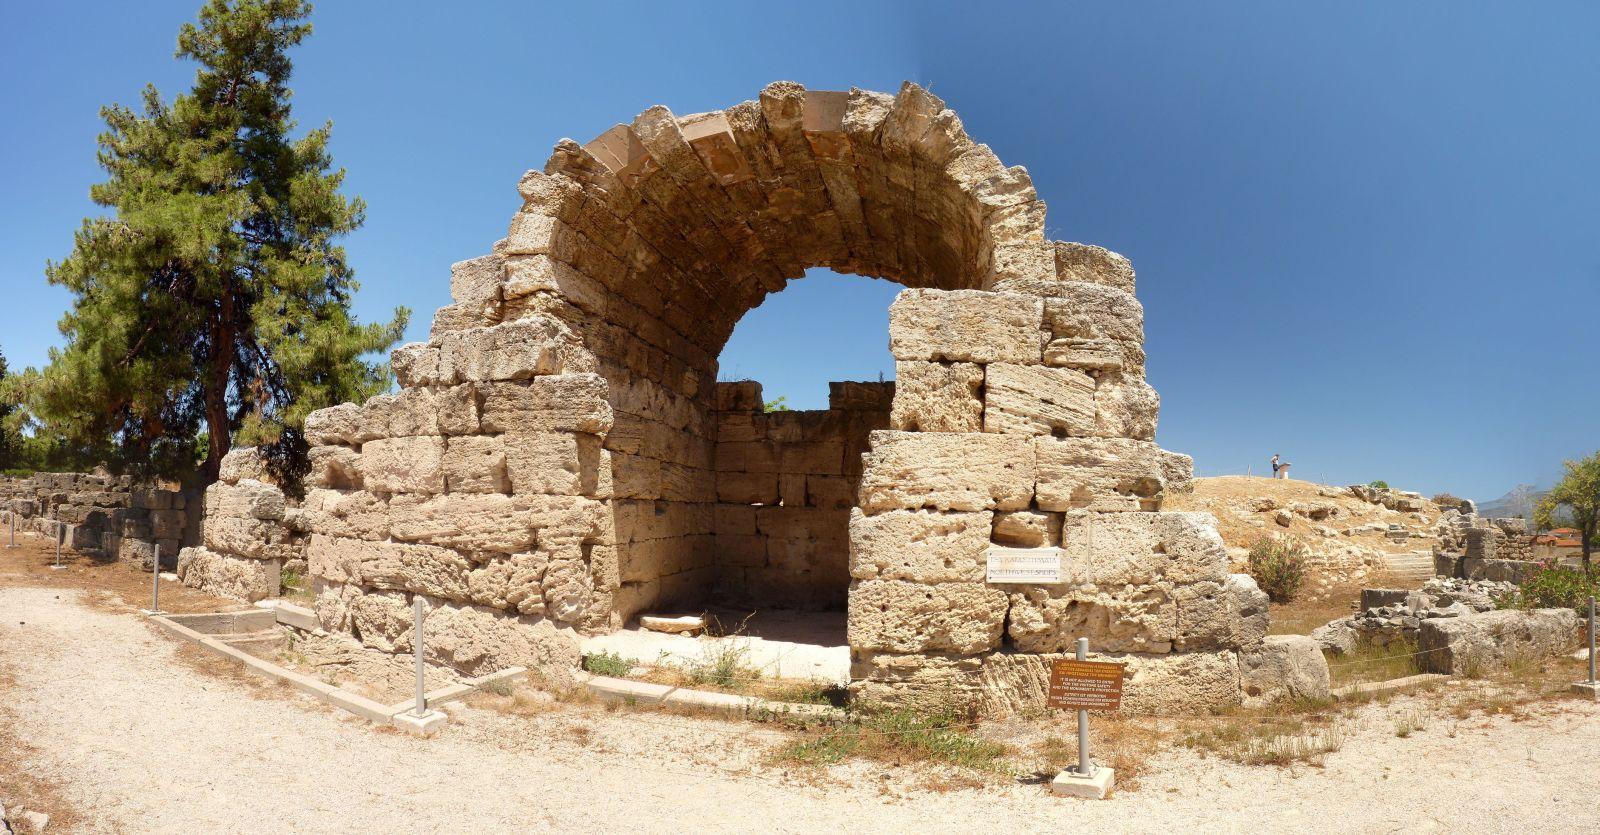 File:Ancient Corinth - Northwest Shops.jpg - Wikimedia Commons